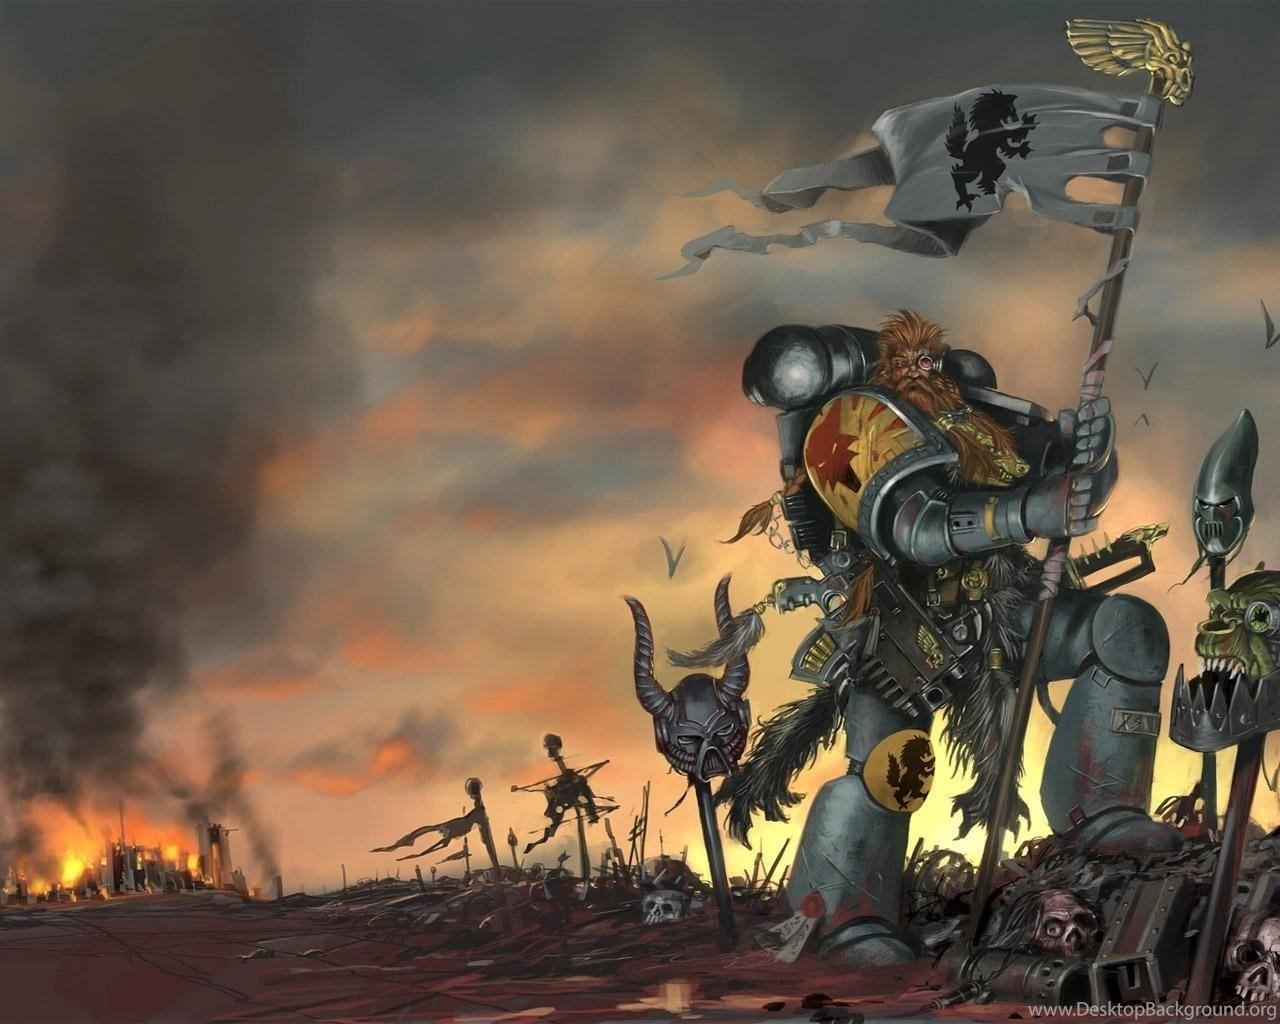 Brotherhood Of Steel Games Hd Wallpapers Desktop Background